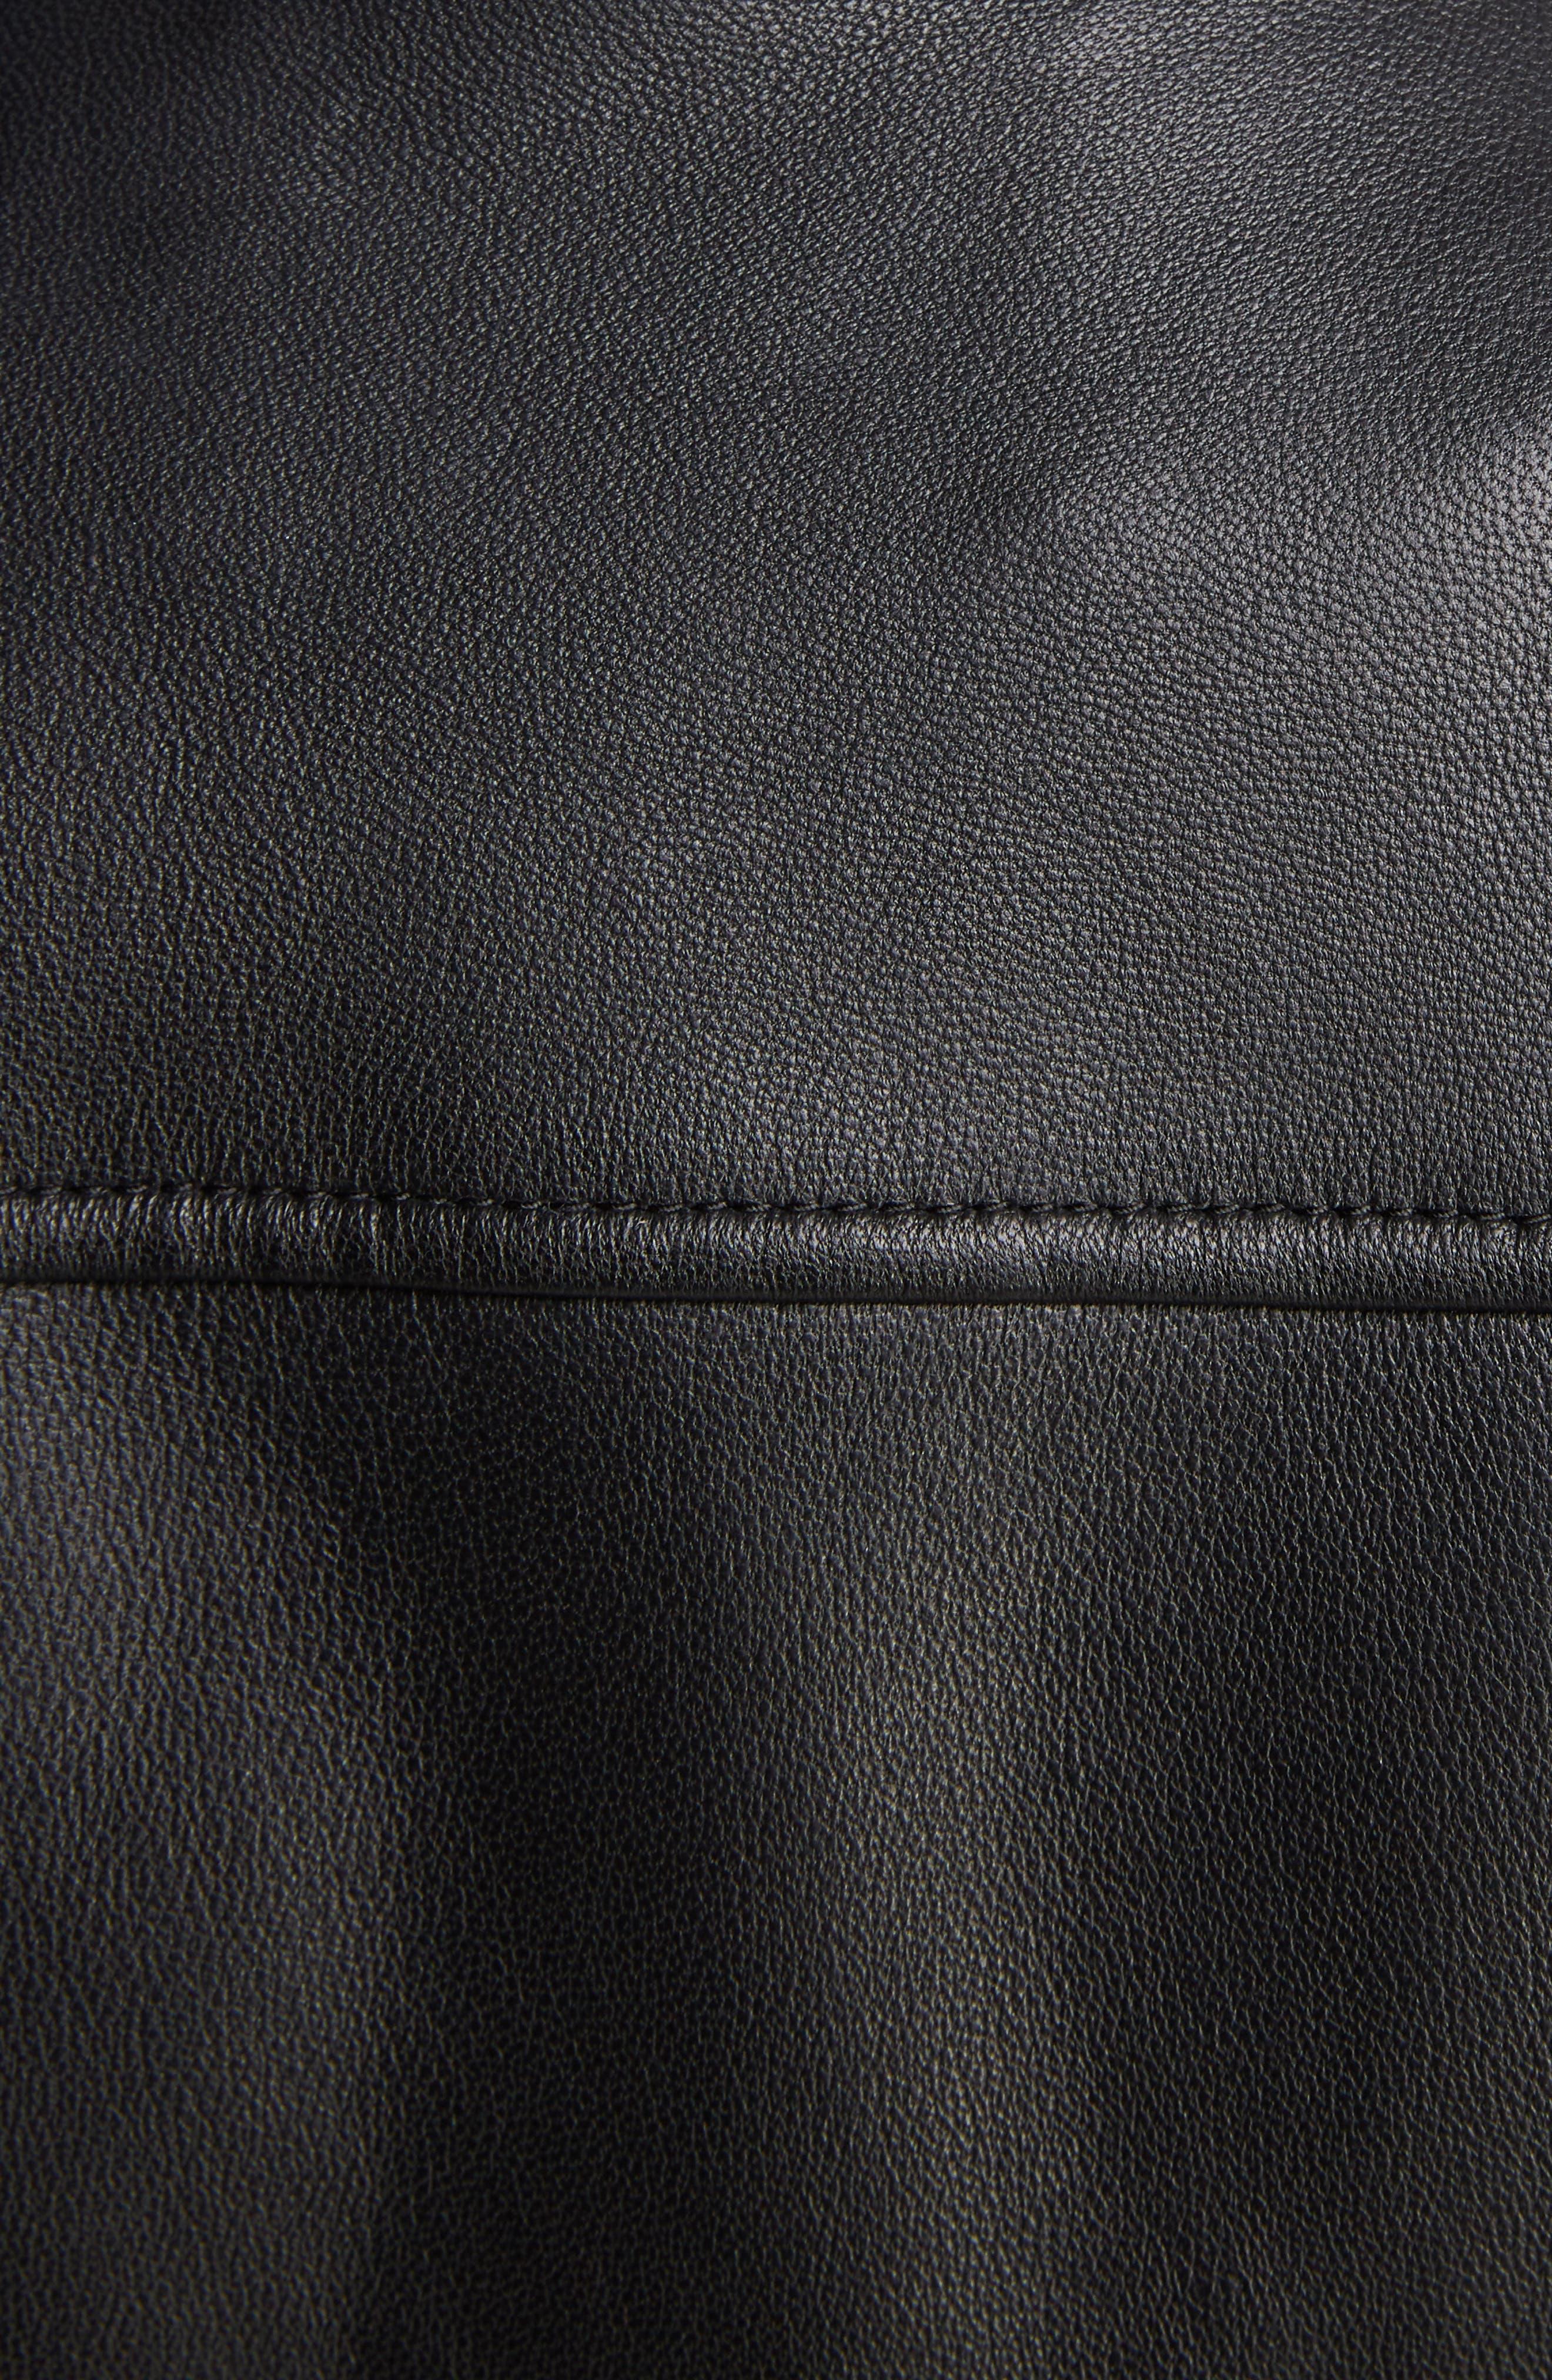 ACNE STUDIOS,                             Lewis Leather Moto Jacket,                             Alternate thumbnail 5, color,                             BLACK